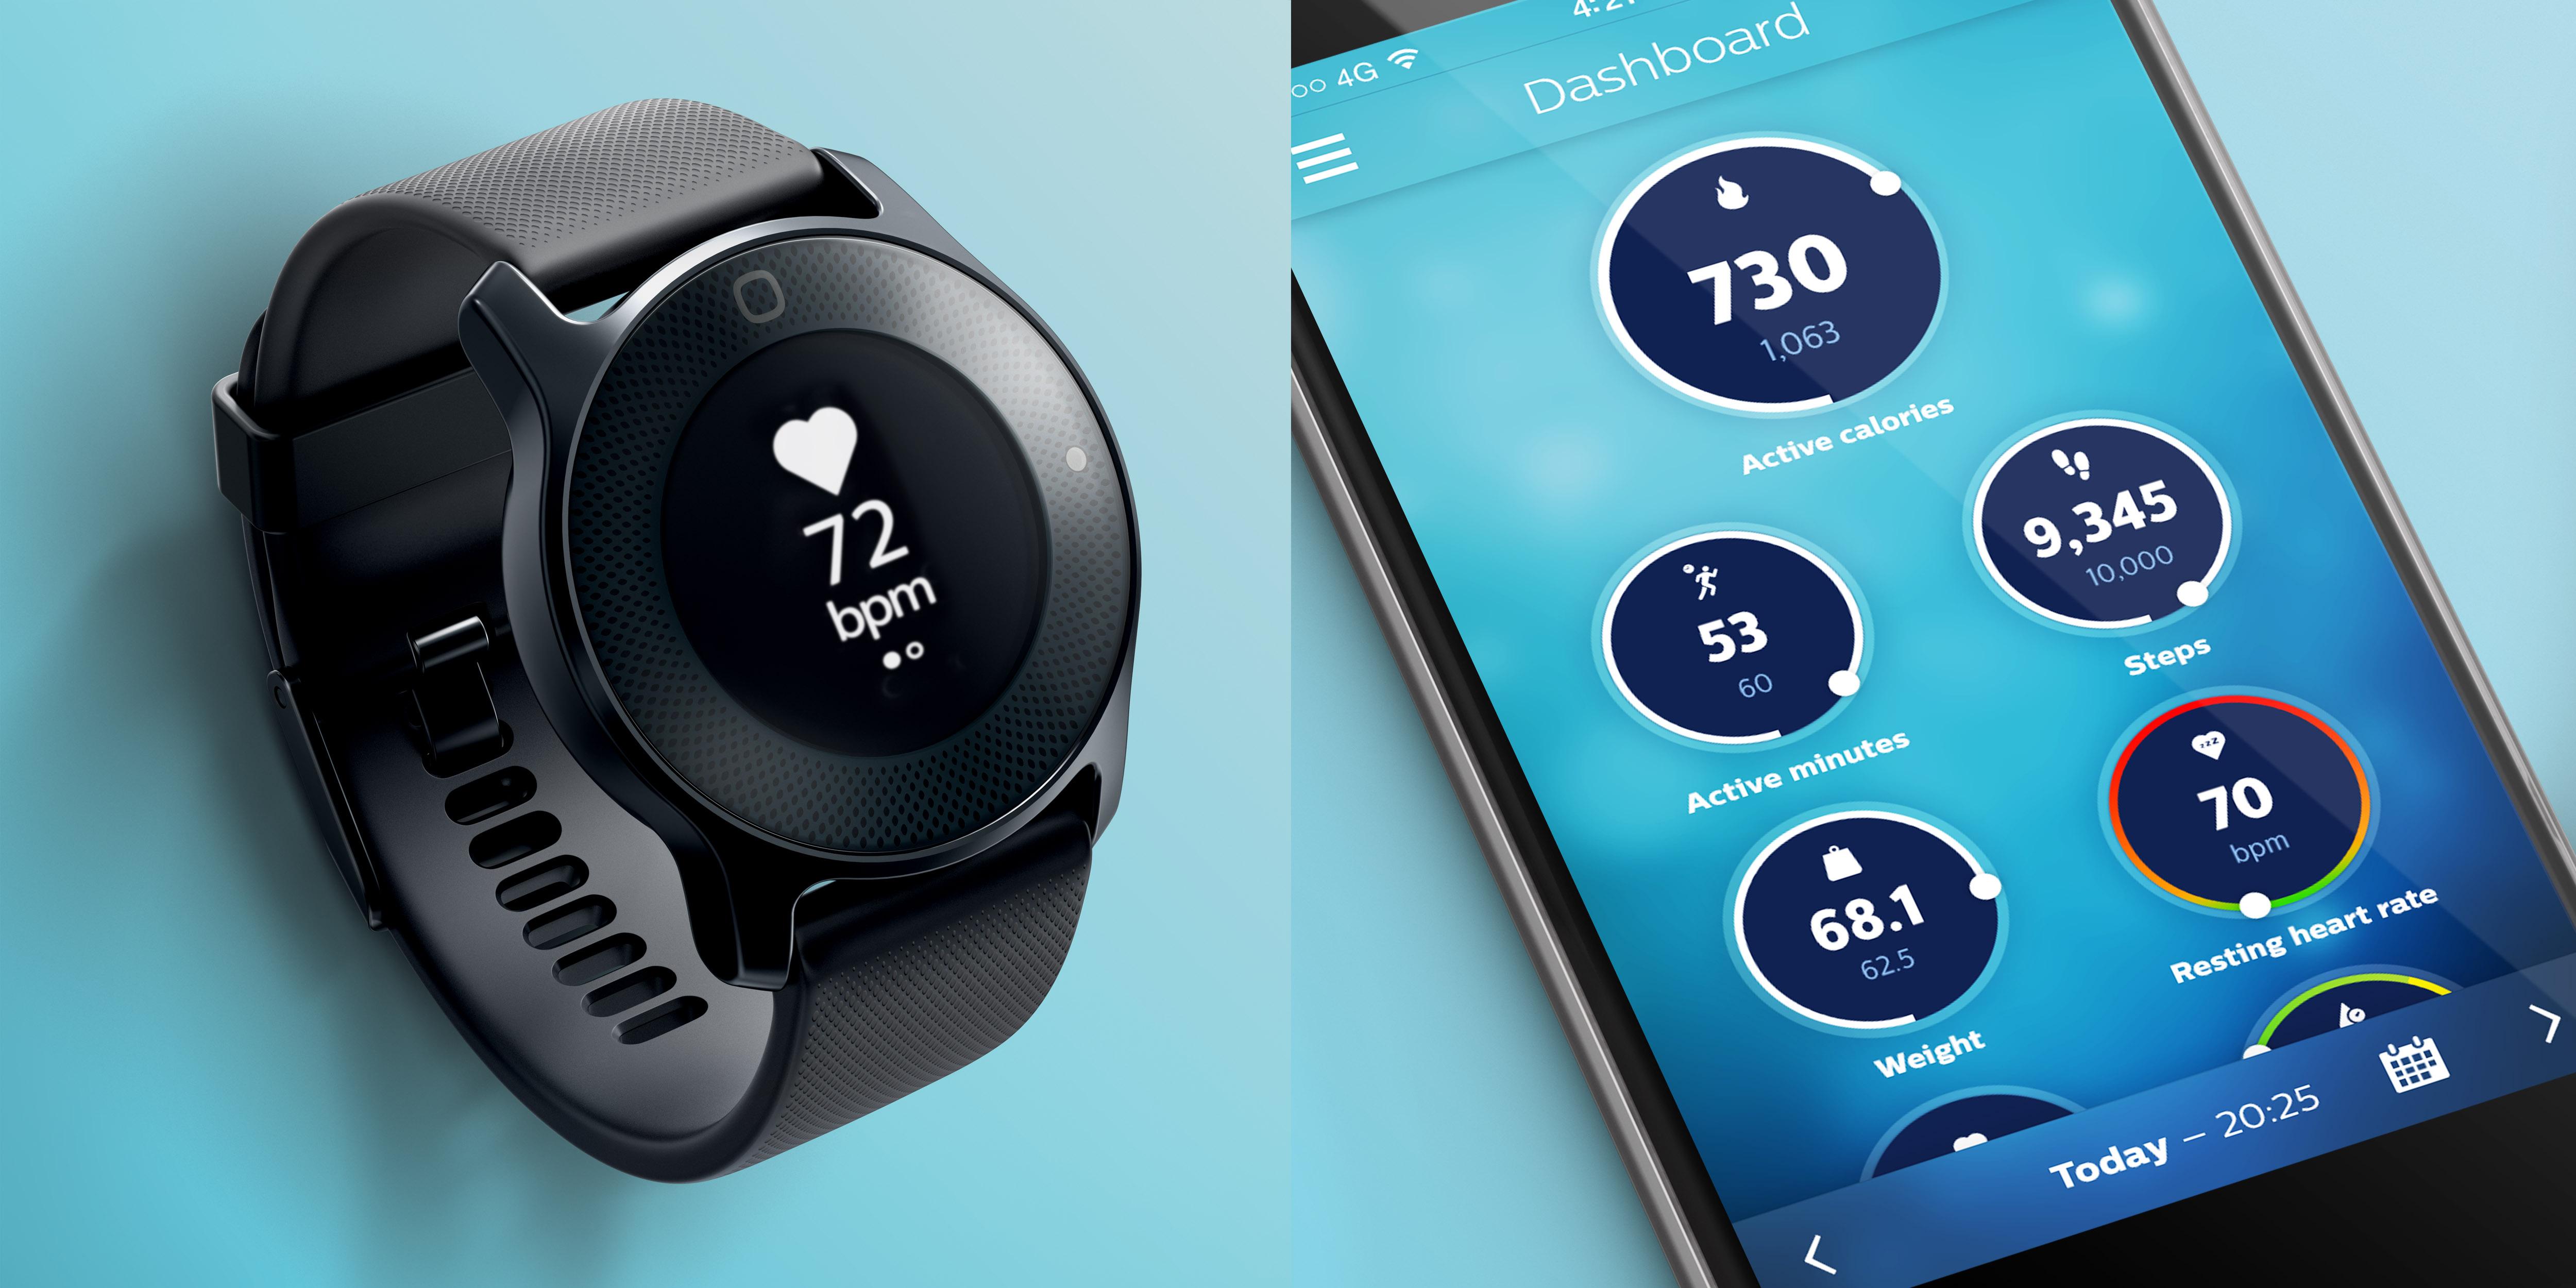 Philips_health_watch_app